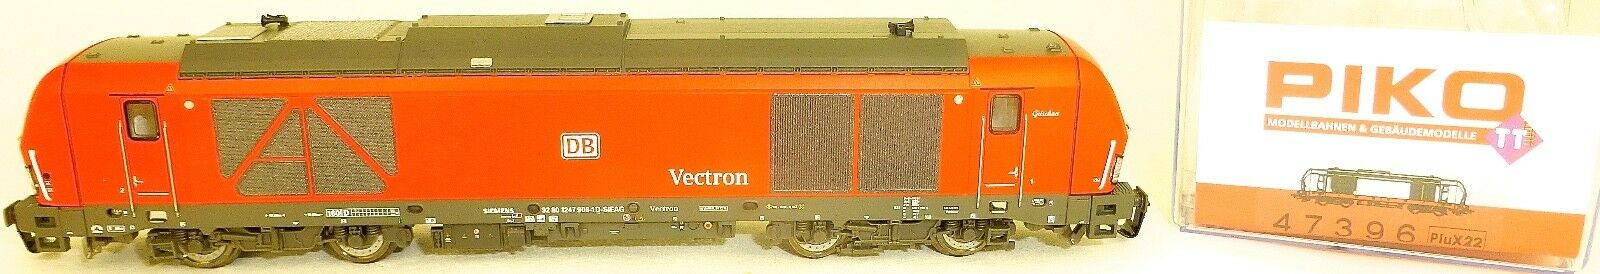 Locomotiva Diesel Vectron BR247 Db-Cargo Epvi PluX22 Piko 47396 Tt 1:120 Nuovo